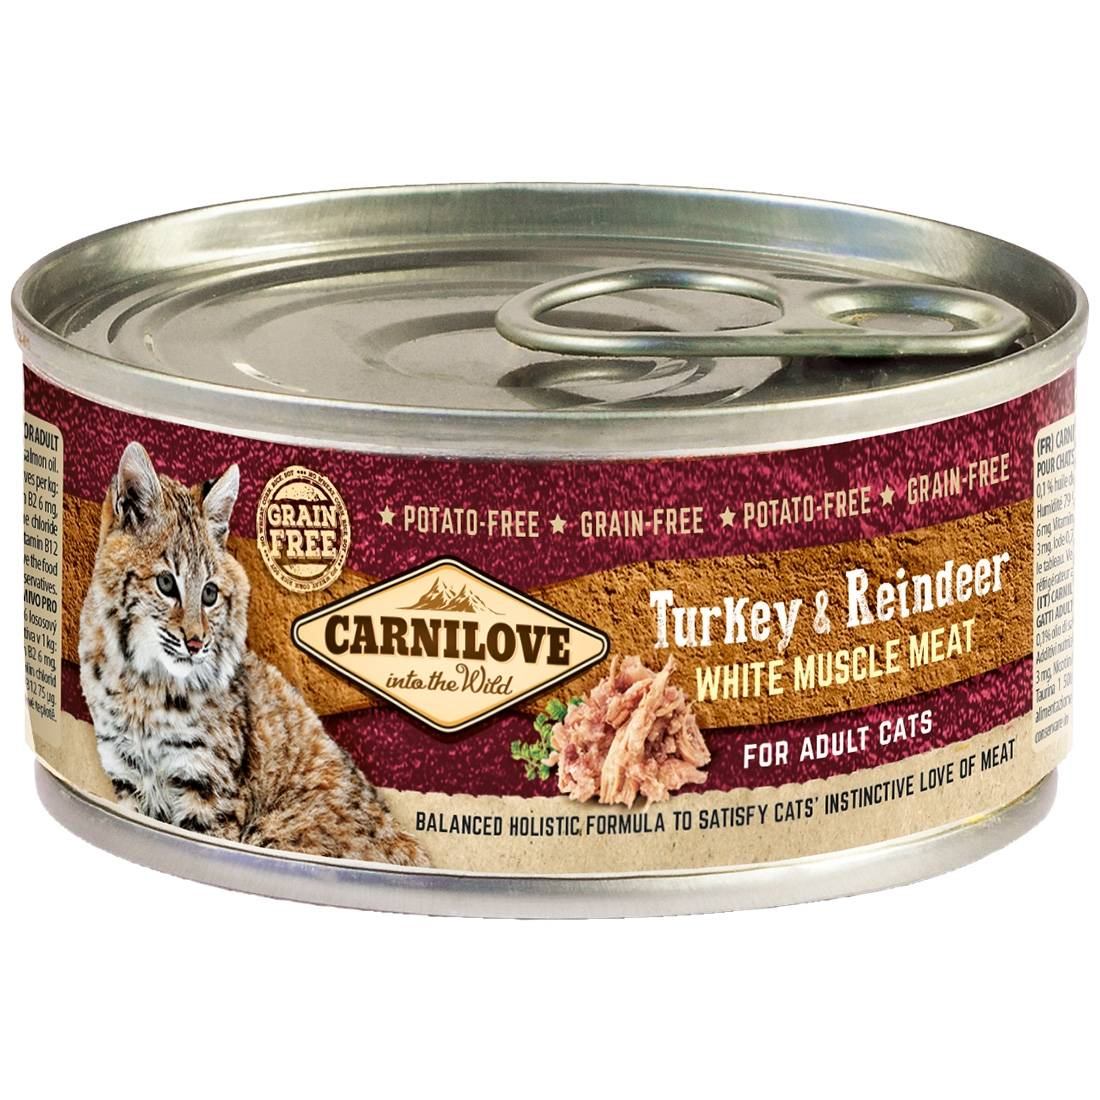 Carnilove Boites chat CARNILOVE Adult Turkey & Reindeer Contenance : 6 boites de 100 g